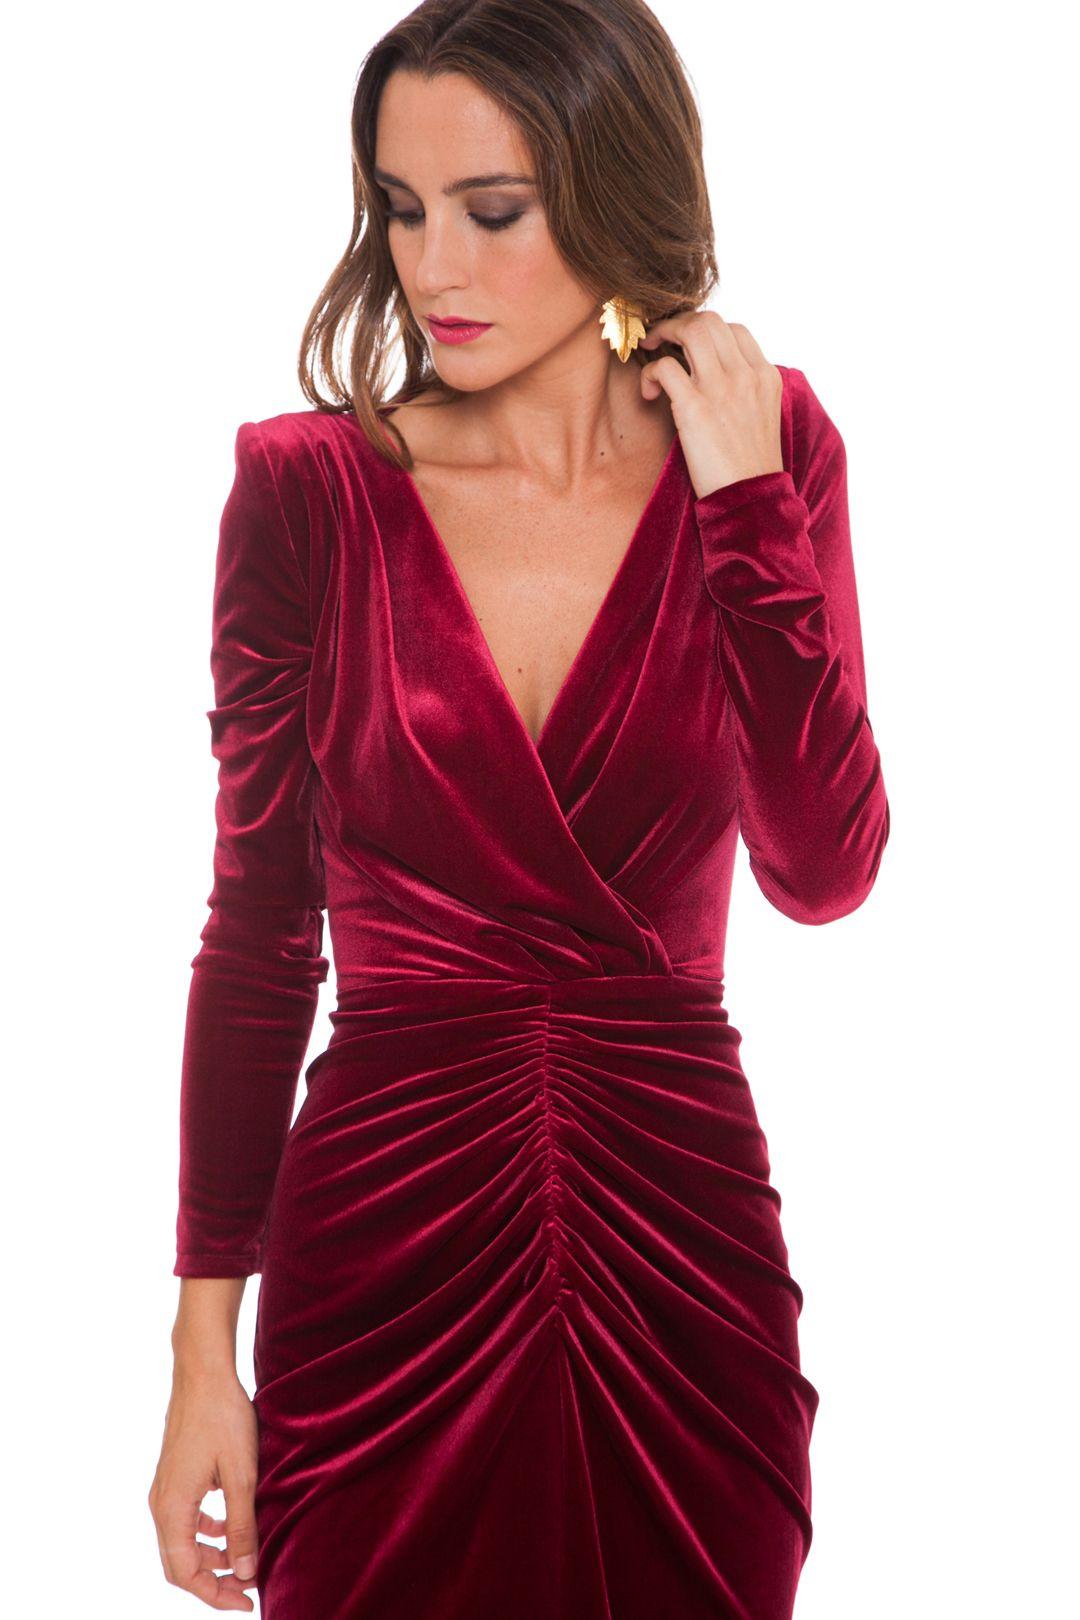 Vestido Eugenia Velvet Burdeos En 2019 Vestidos Boda